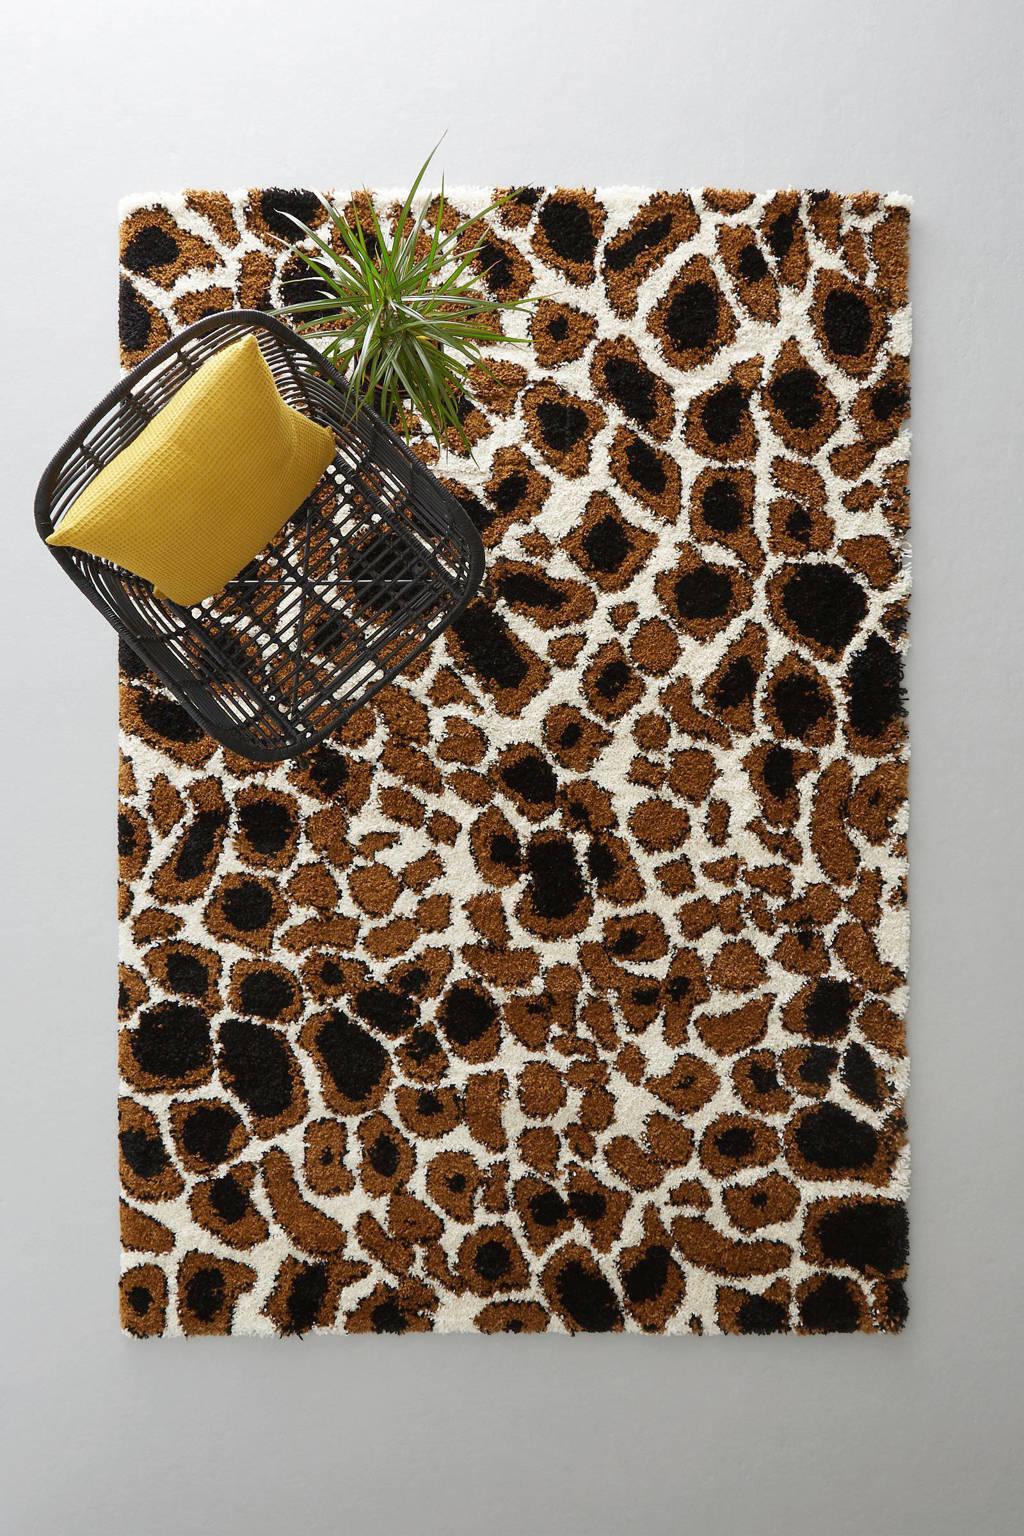 whkmp's own vloerkleed Royal Nomadic  (230x160 cm), Crème, Cognac